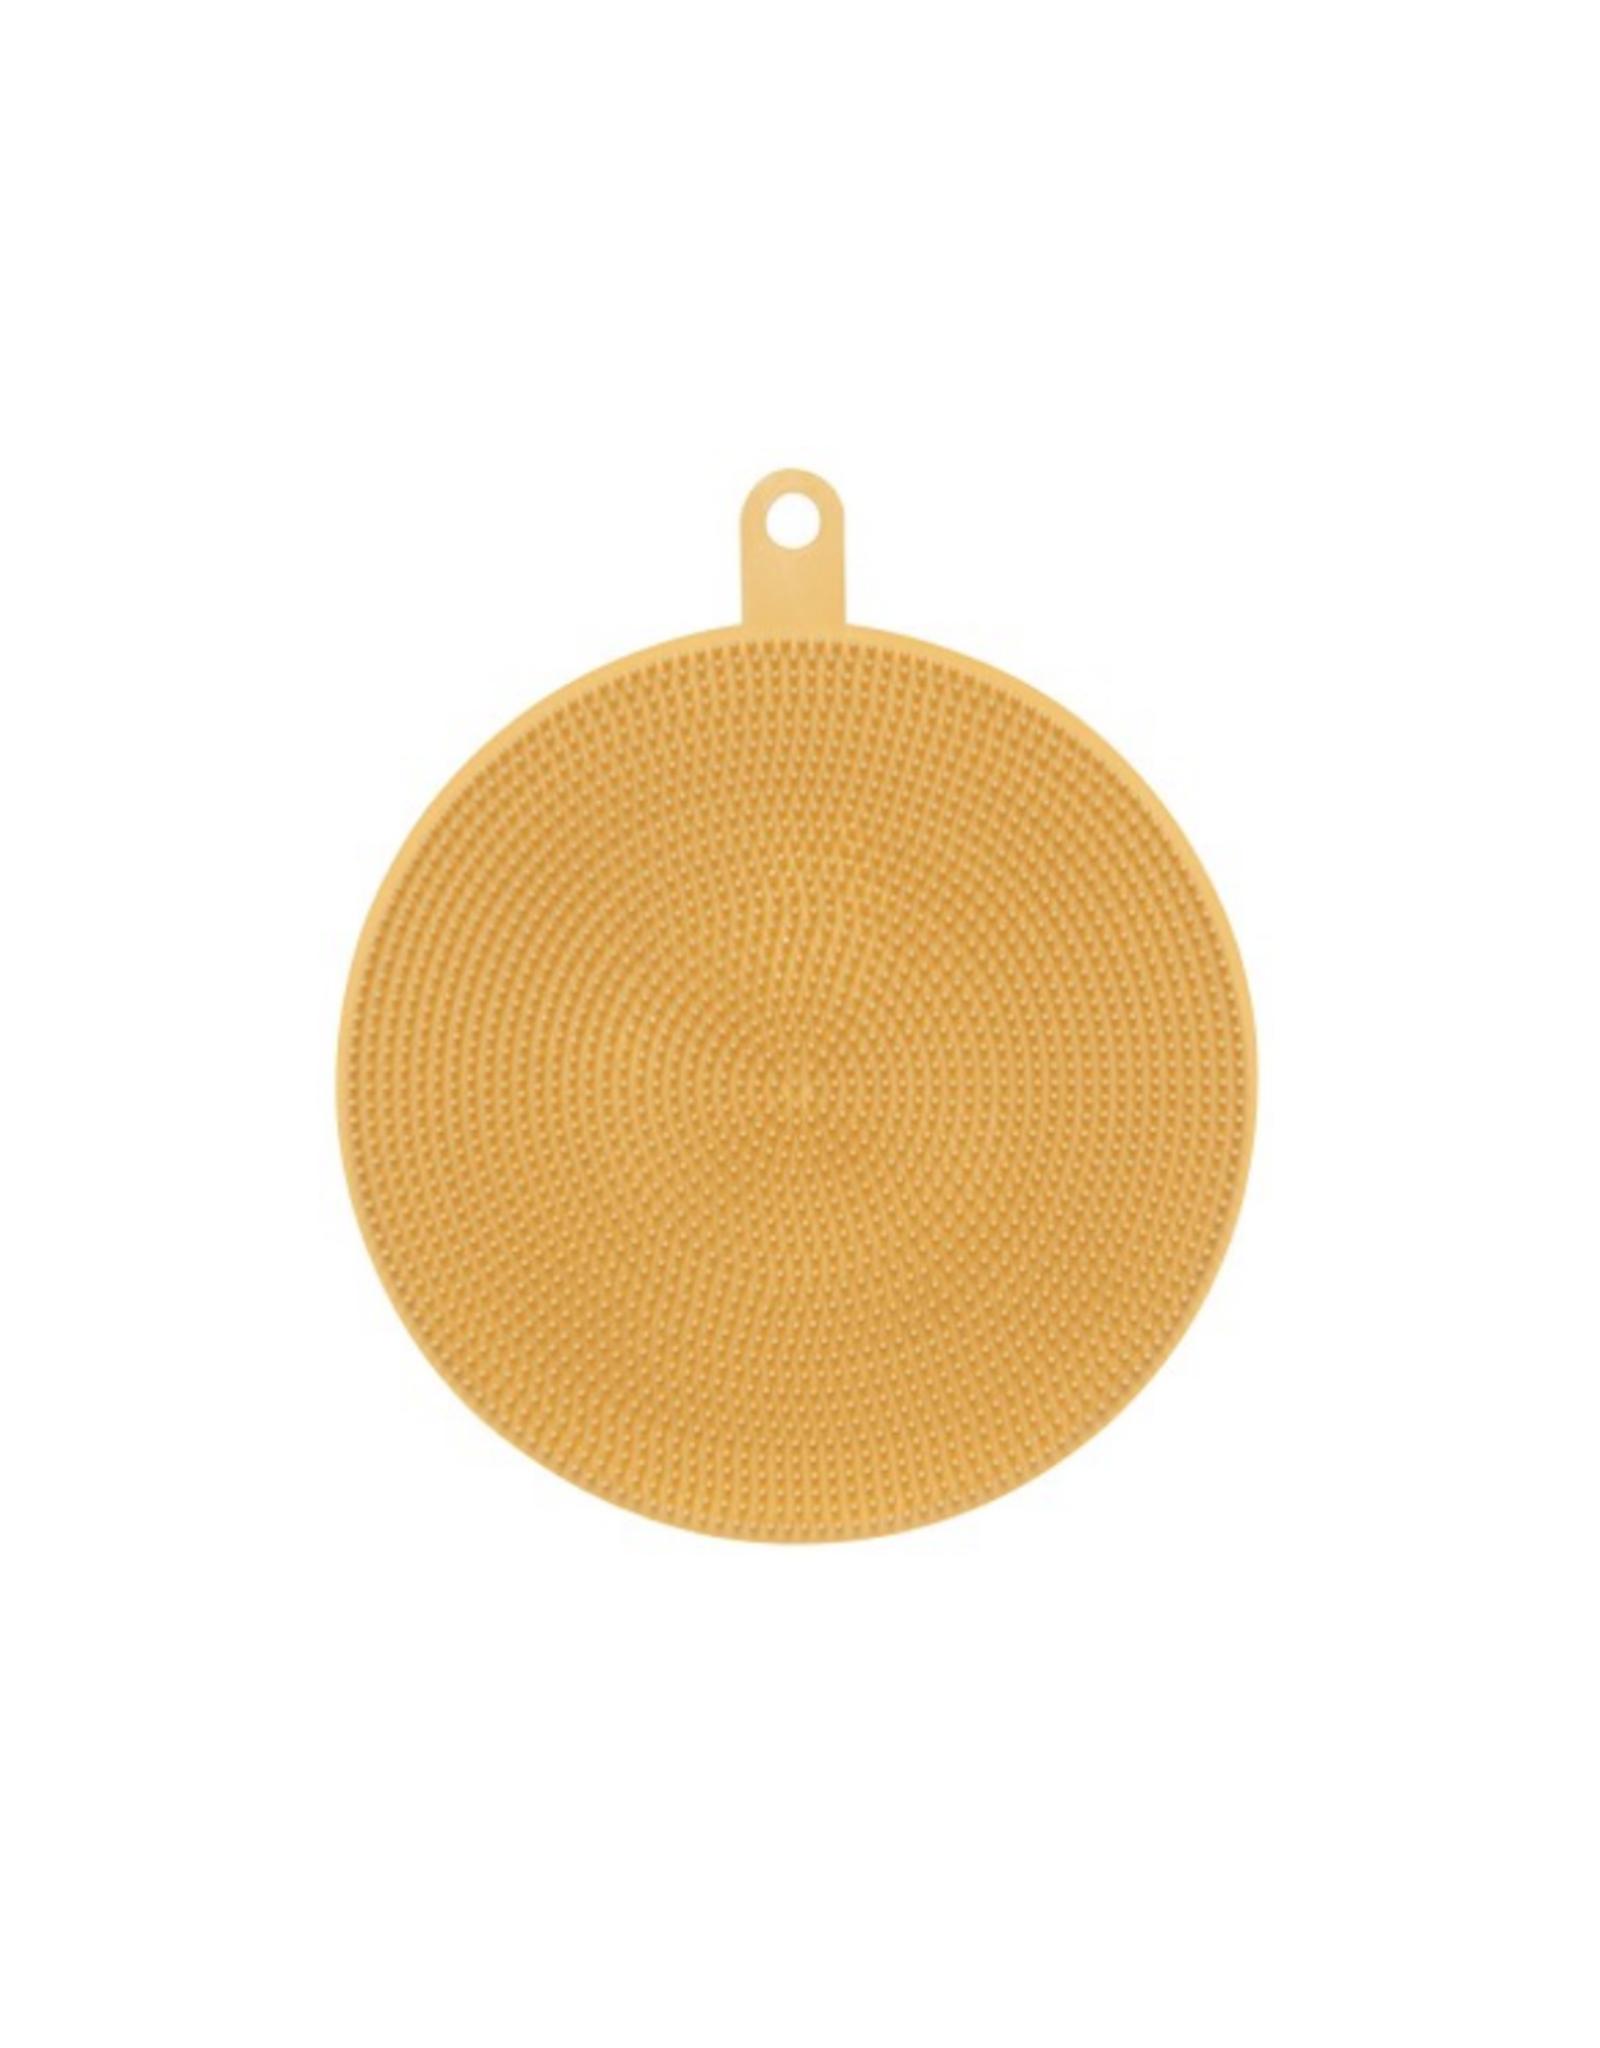 DCA - Scrub or Soap Rest / Silicone, Yellow